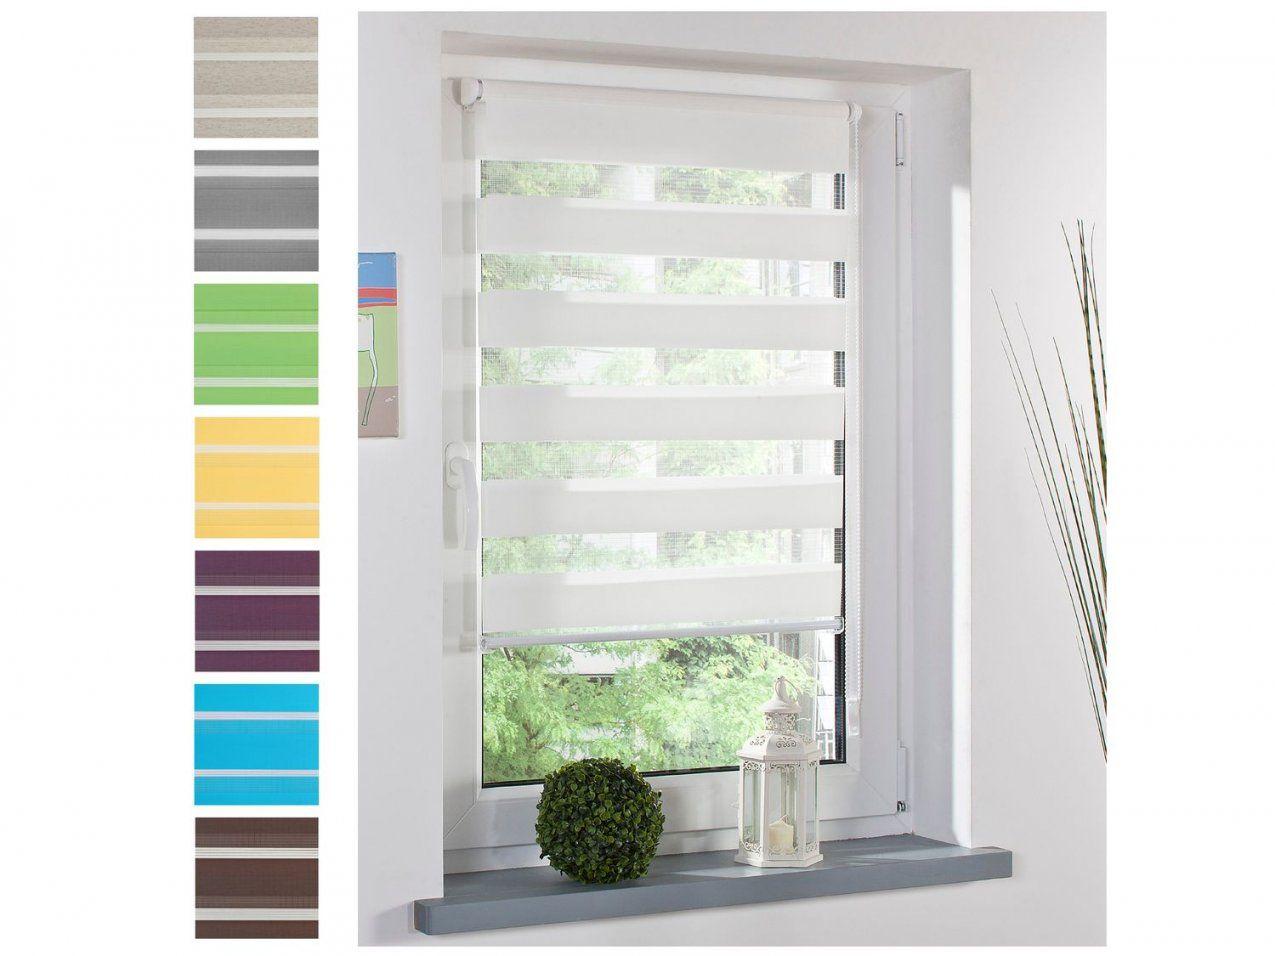 Innen Fenster Elegant Jalousien Rollos Plissees Ohne Bohren Innen von Fenster Rollos Für Innen Ohne Bohren Bild